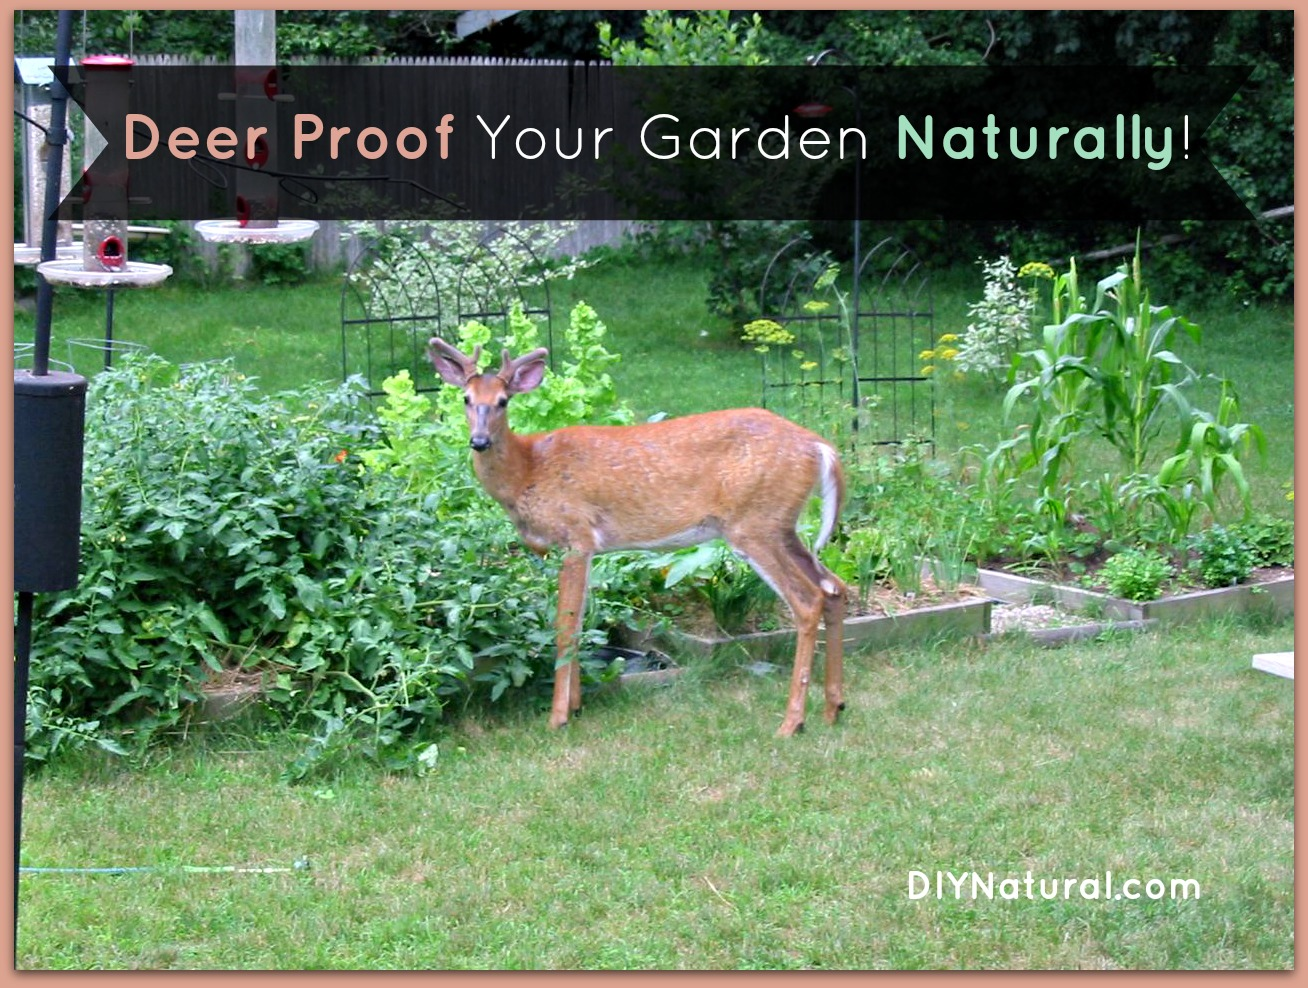 deer proof your garden and yard naturally